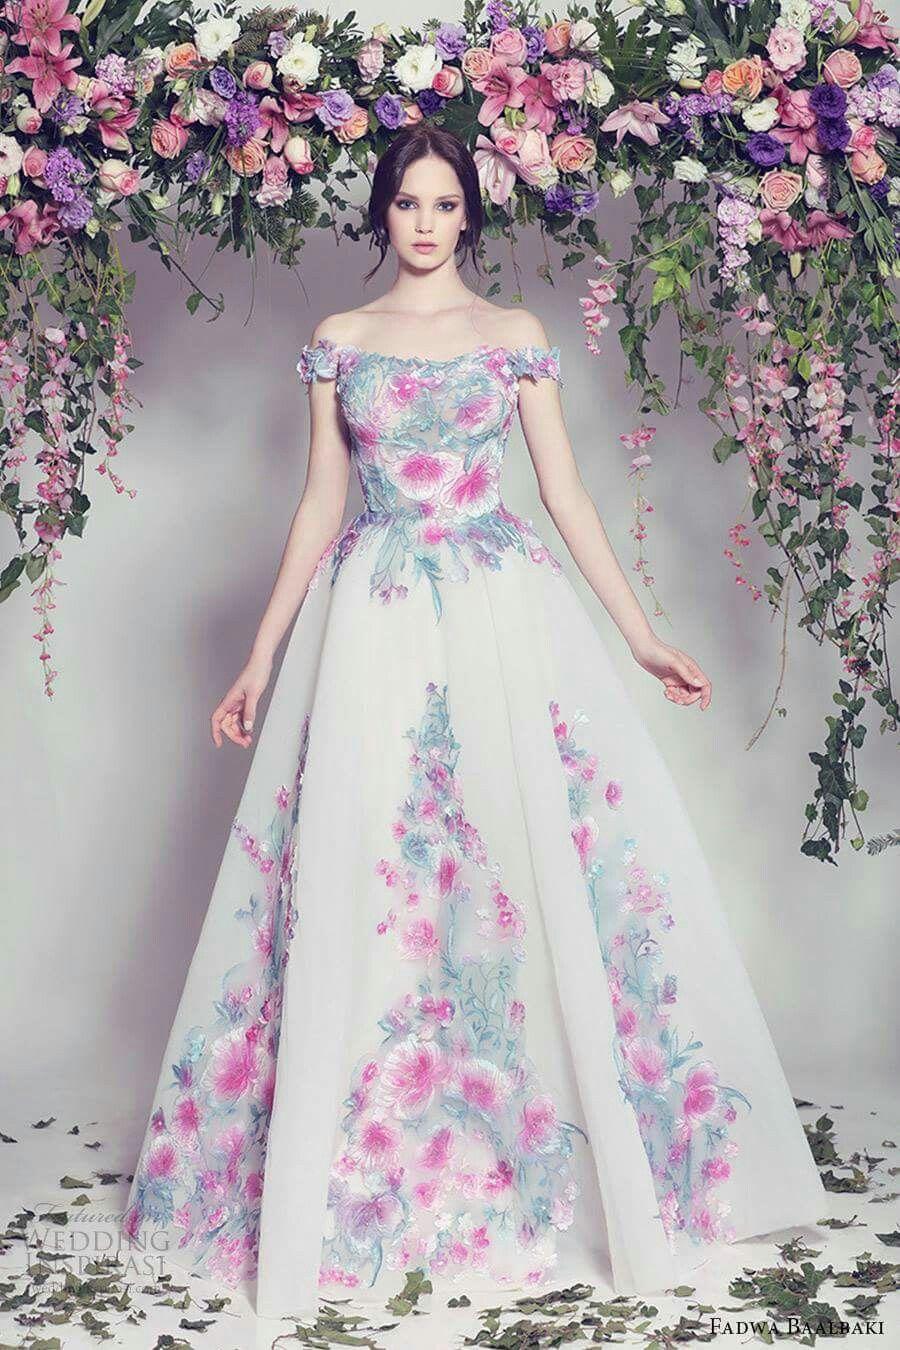 Pin by Monika Shruti on feminine | Pinterest | Gowns, Prom and ...